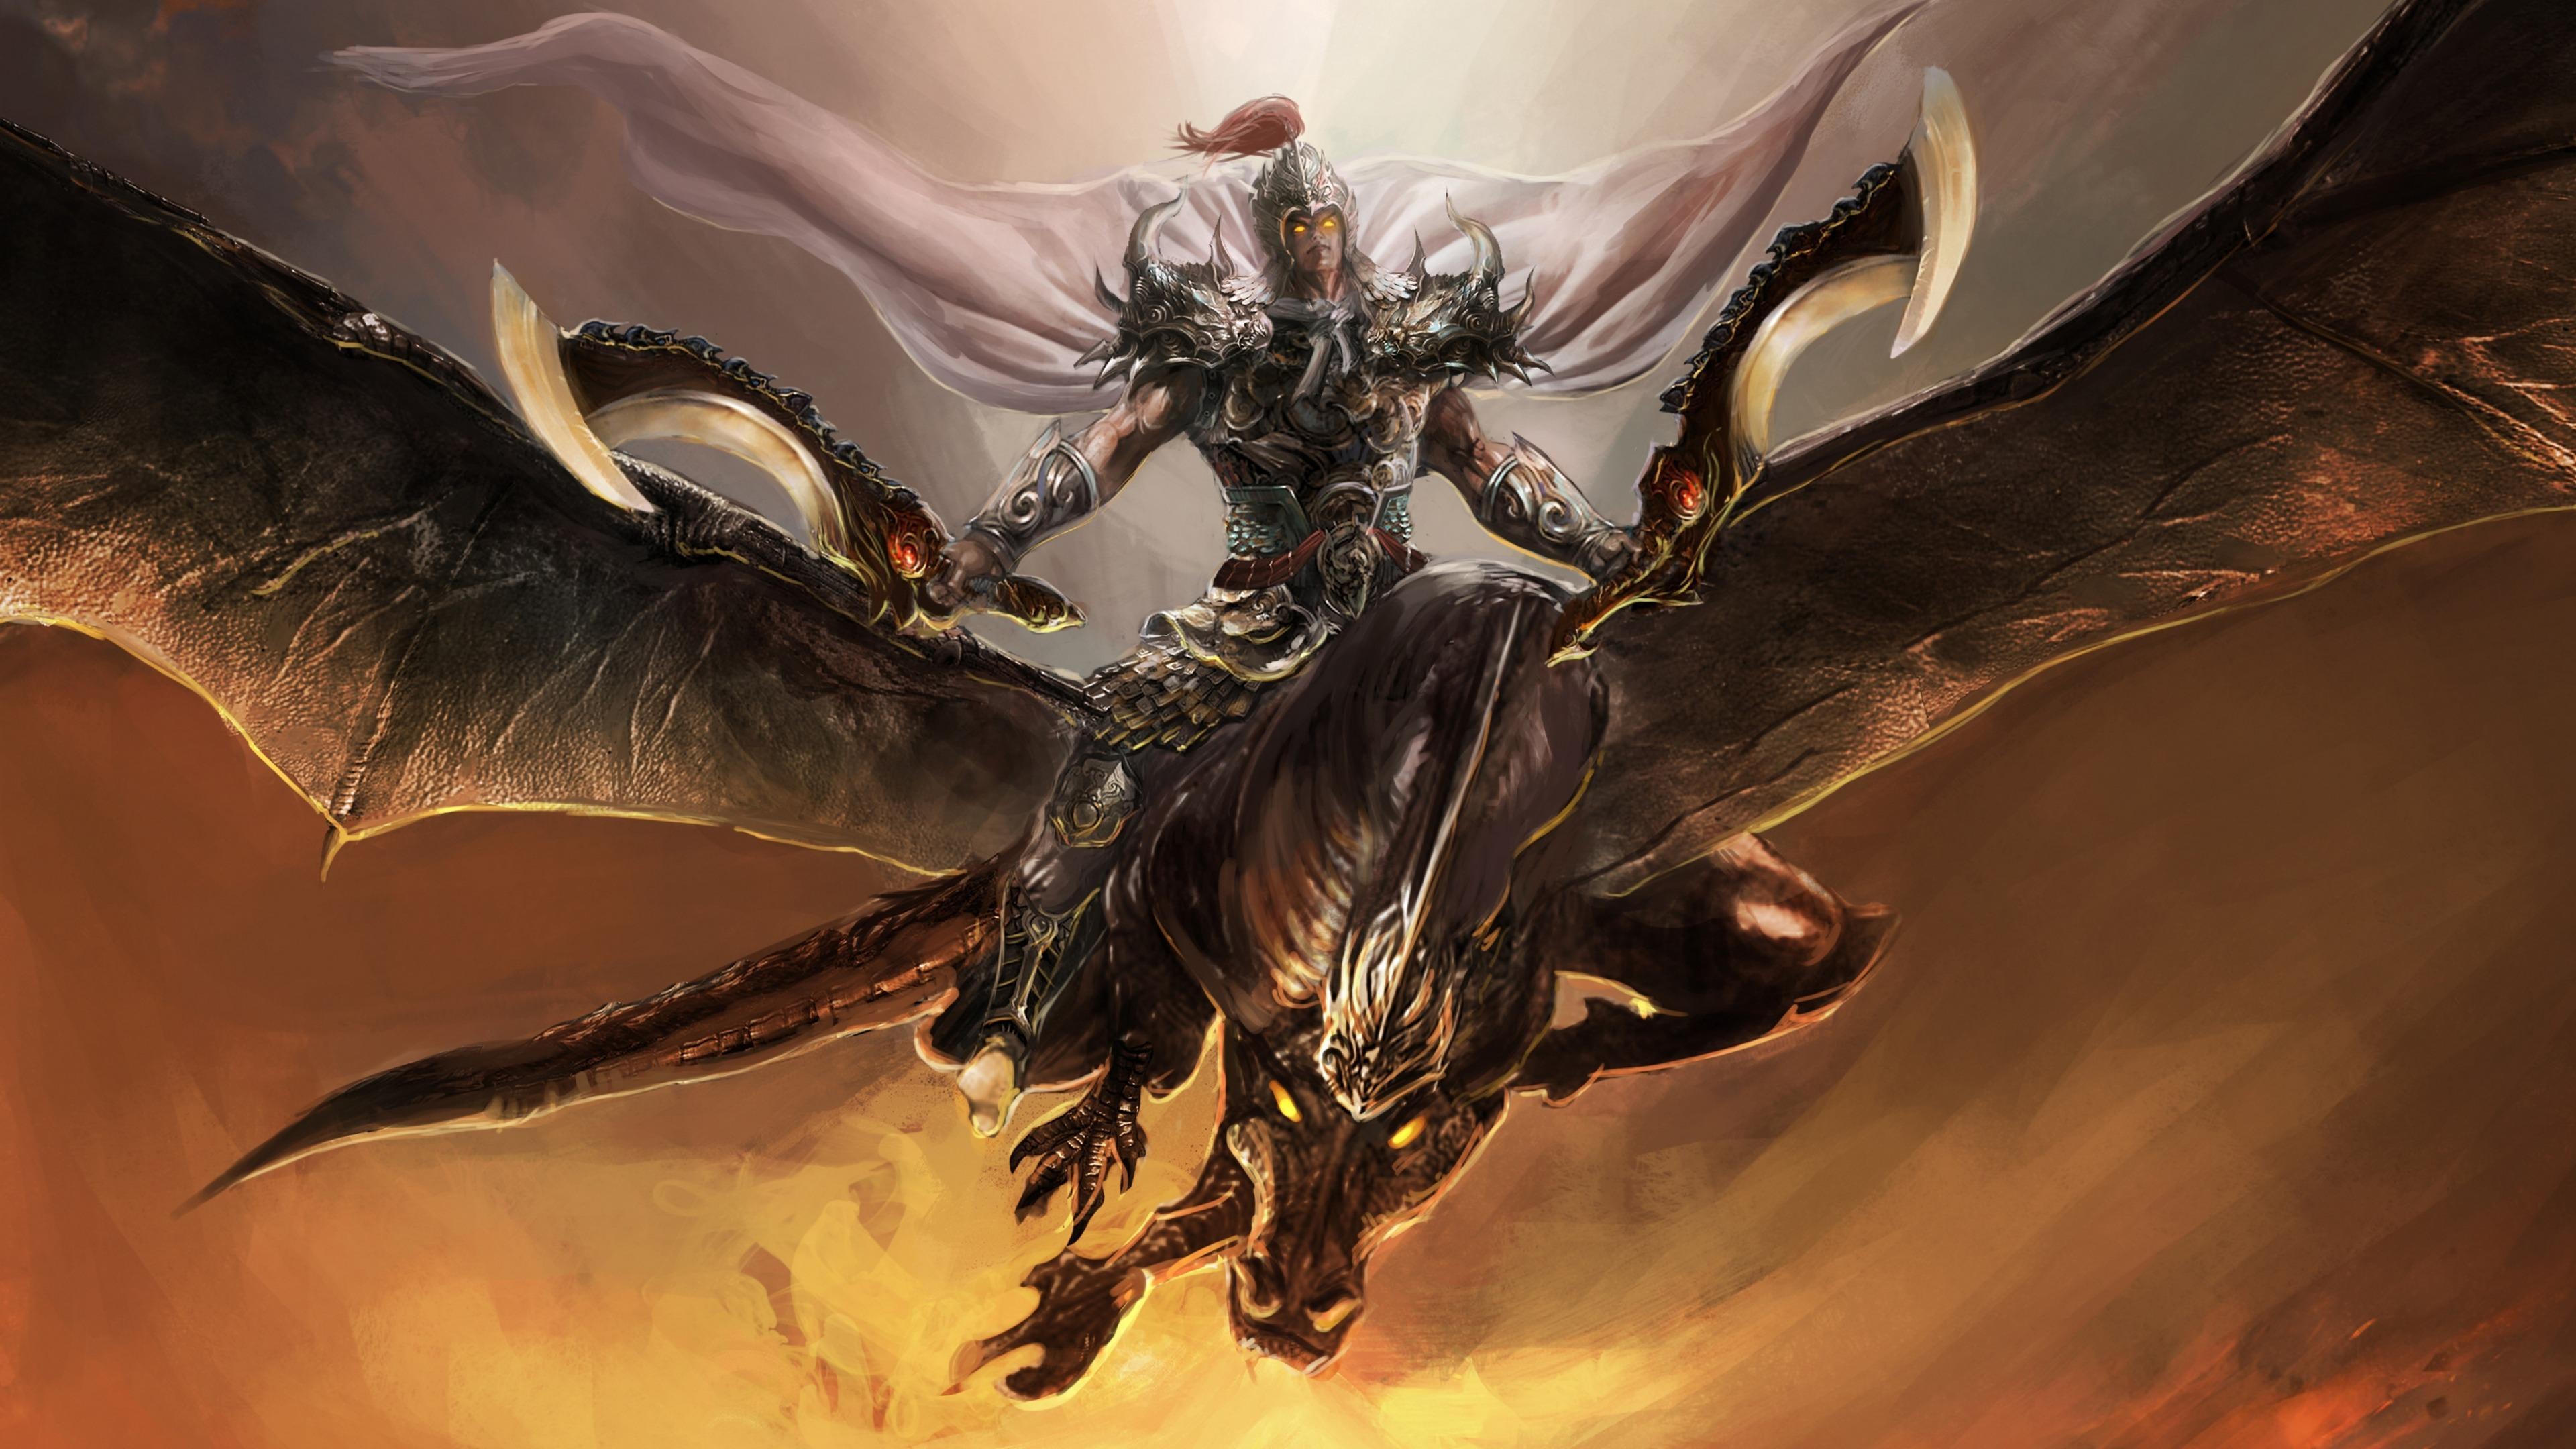 Dragon rider warrior wallpaper